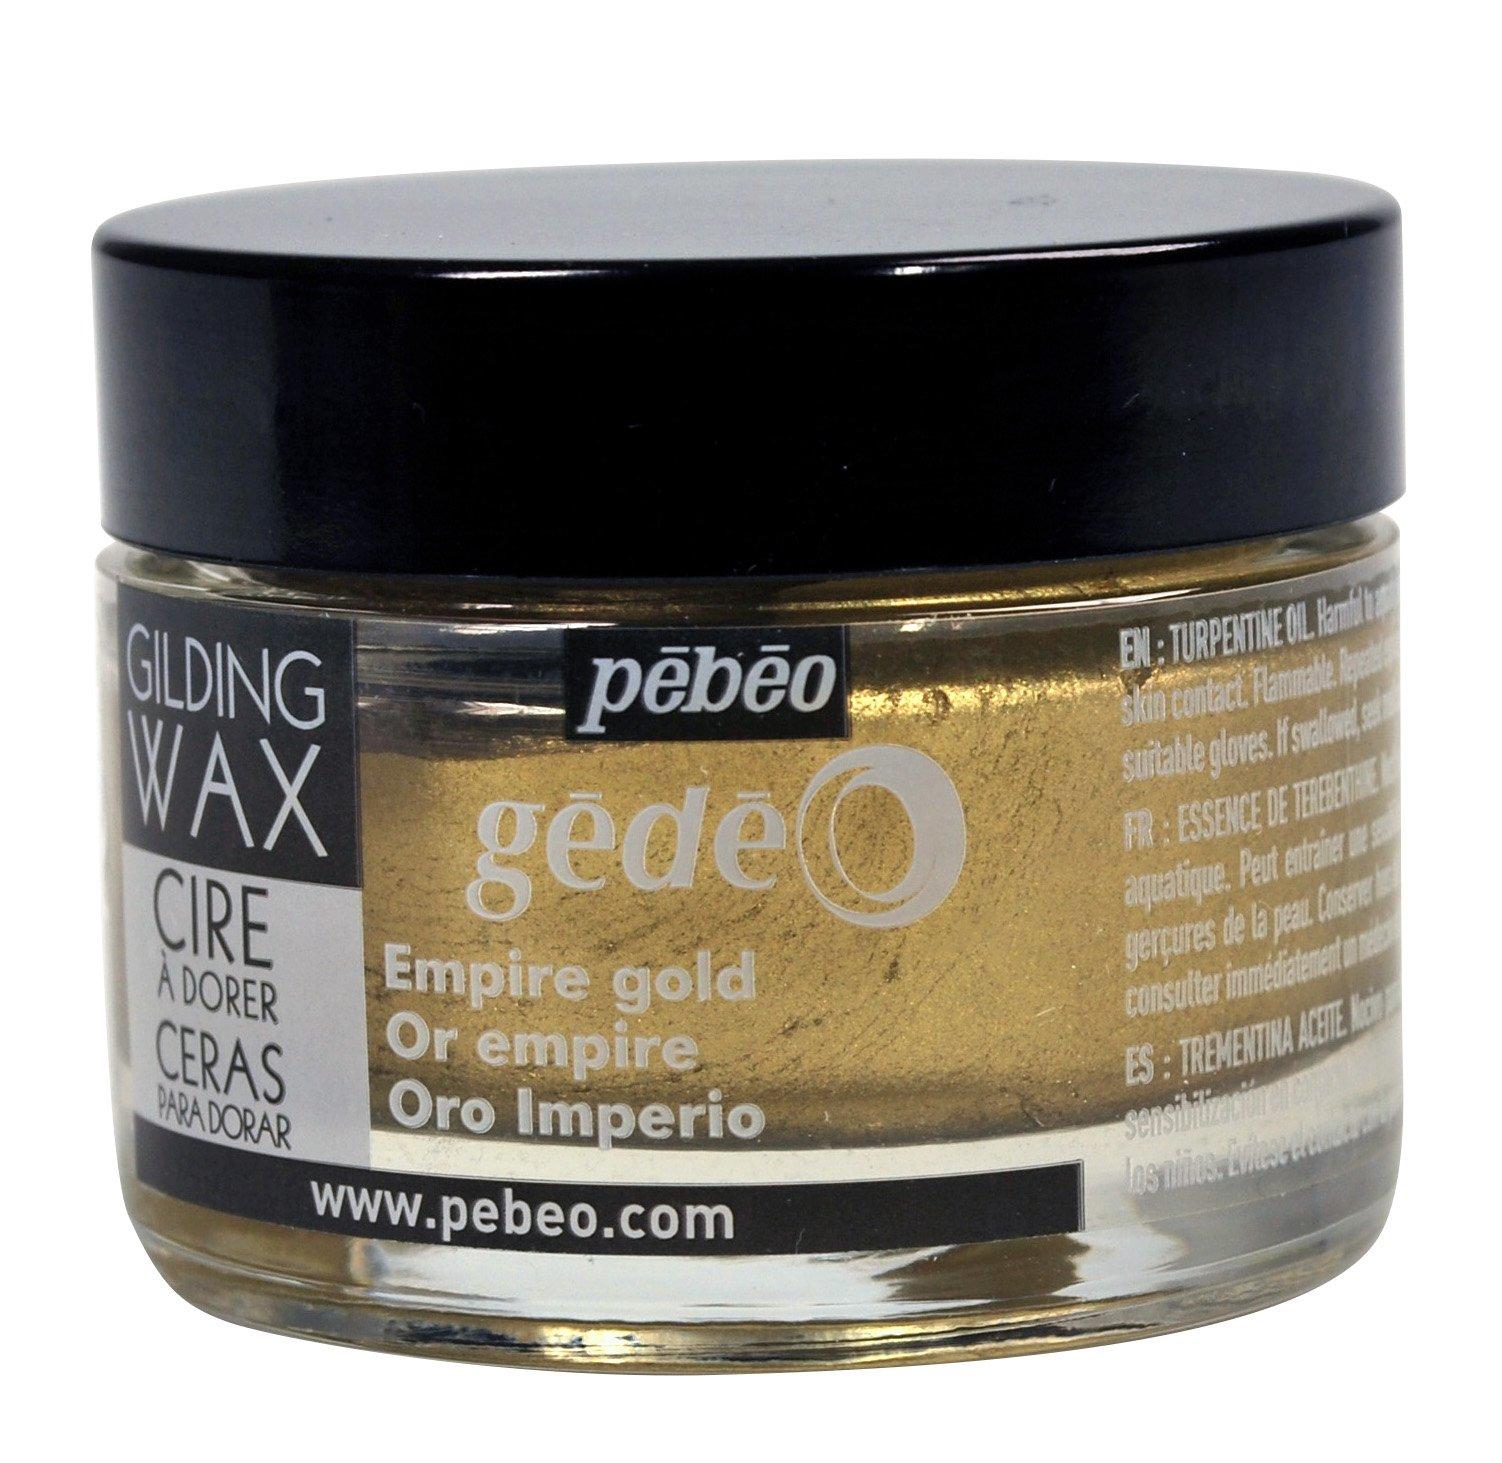 Pebeo Gliding Wax